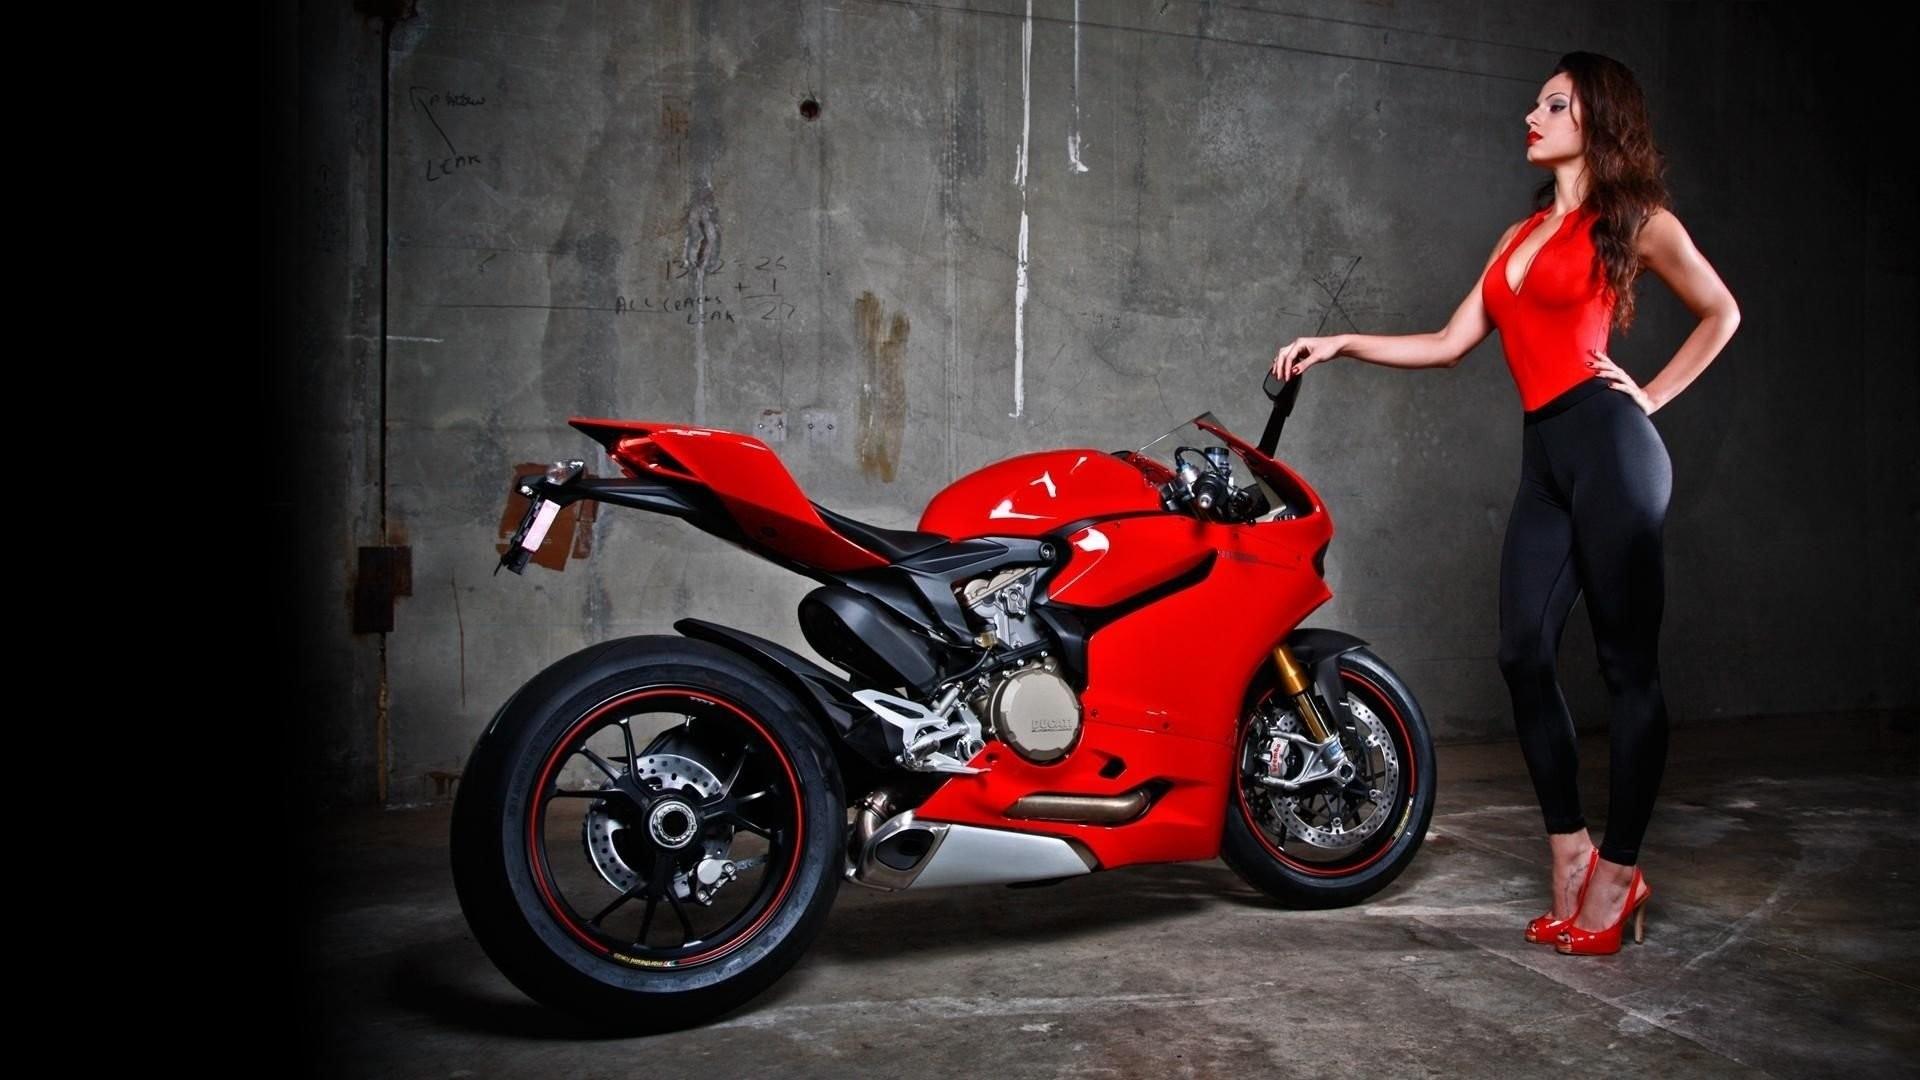 Photos Of Hot Motorcycle Girls